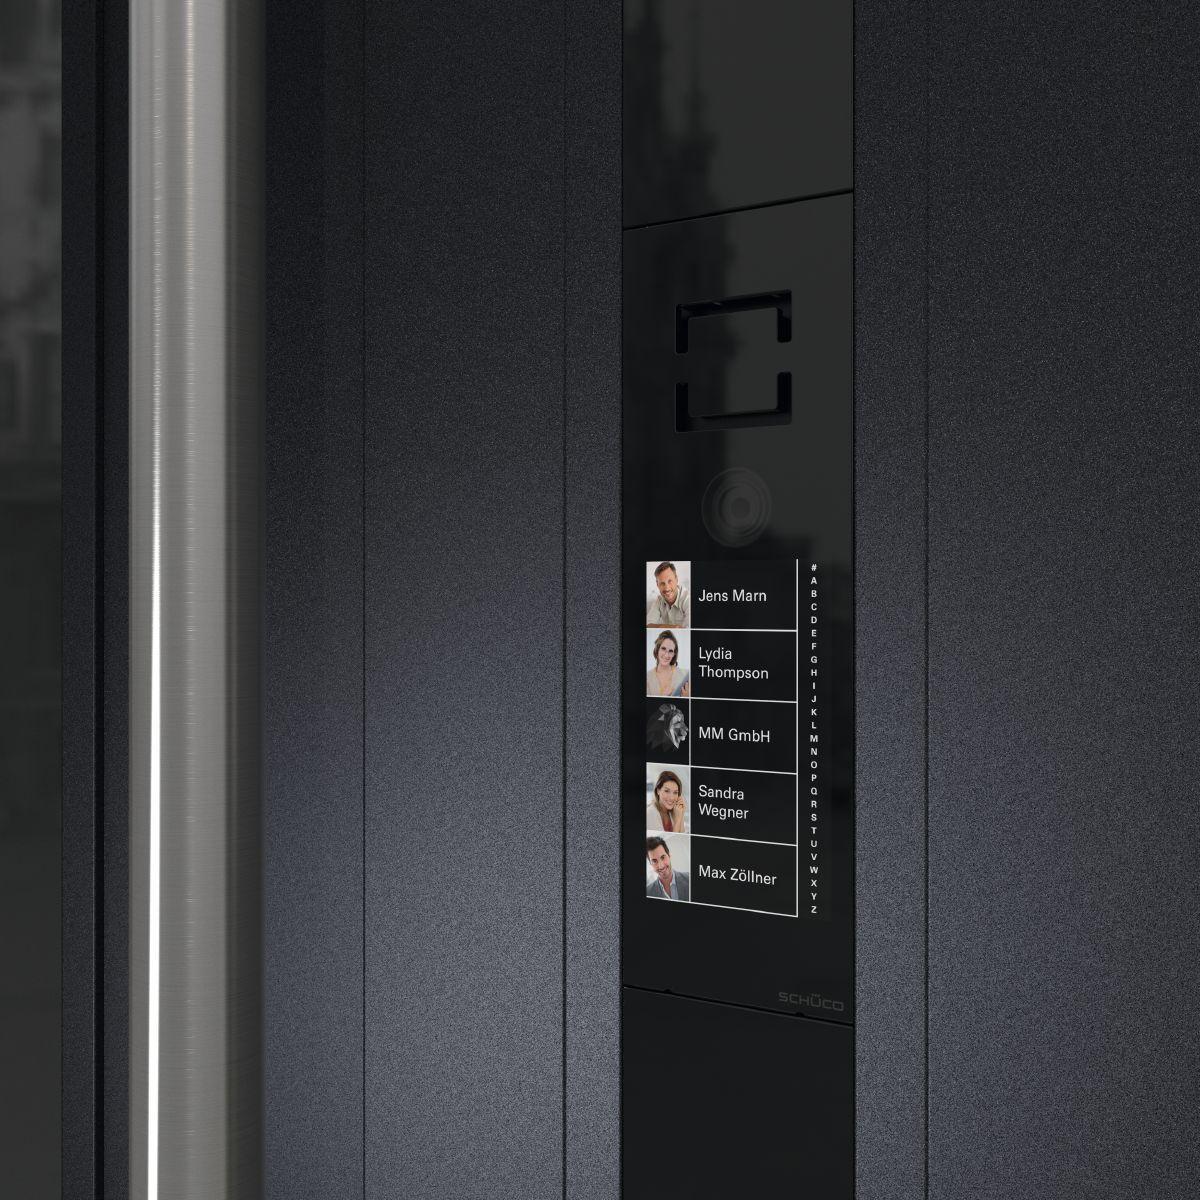 Schüco DCS cu display tactil (Touch Display)